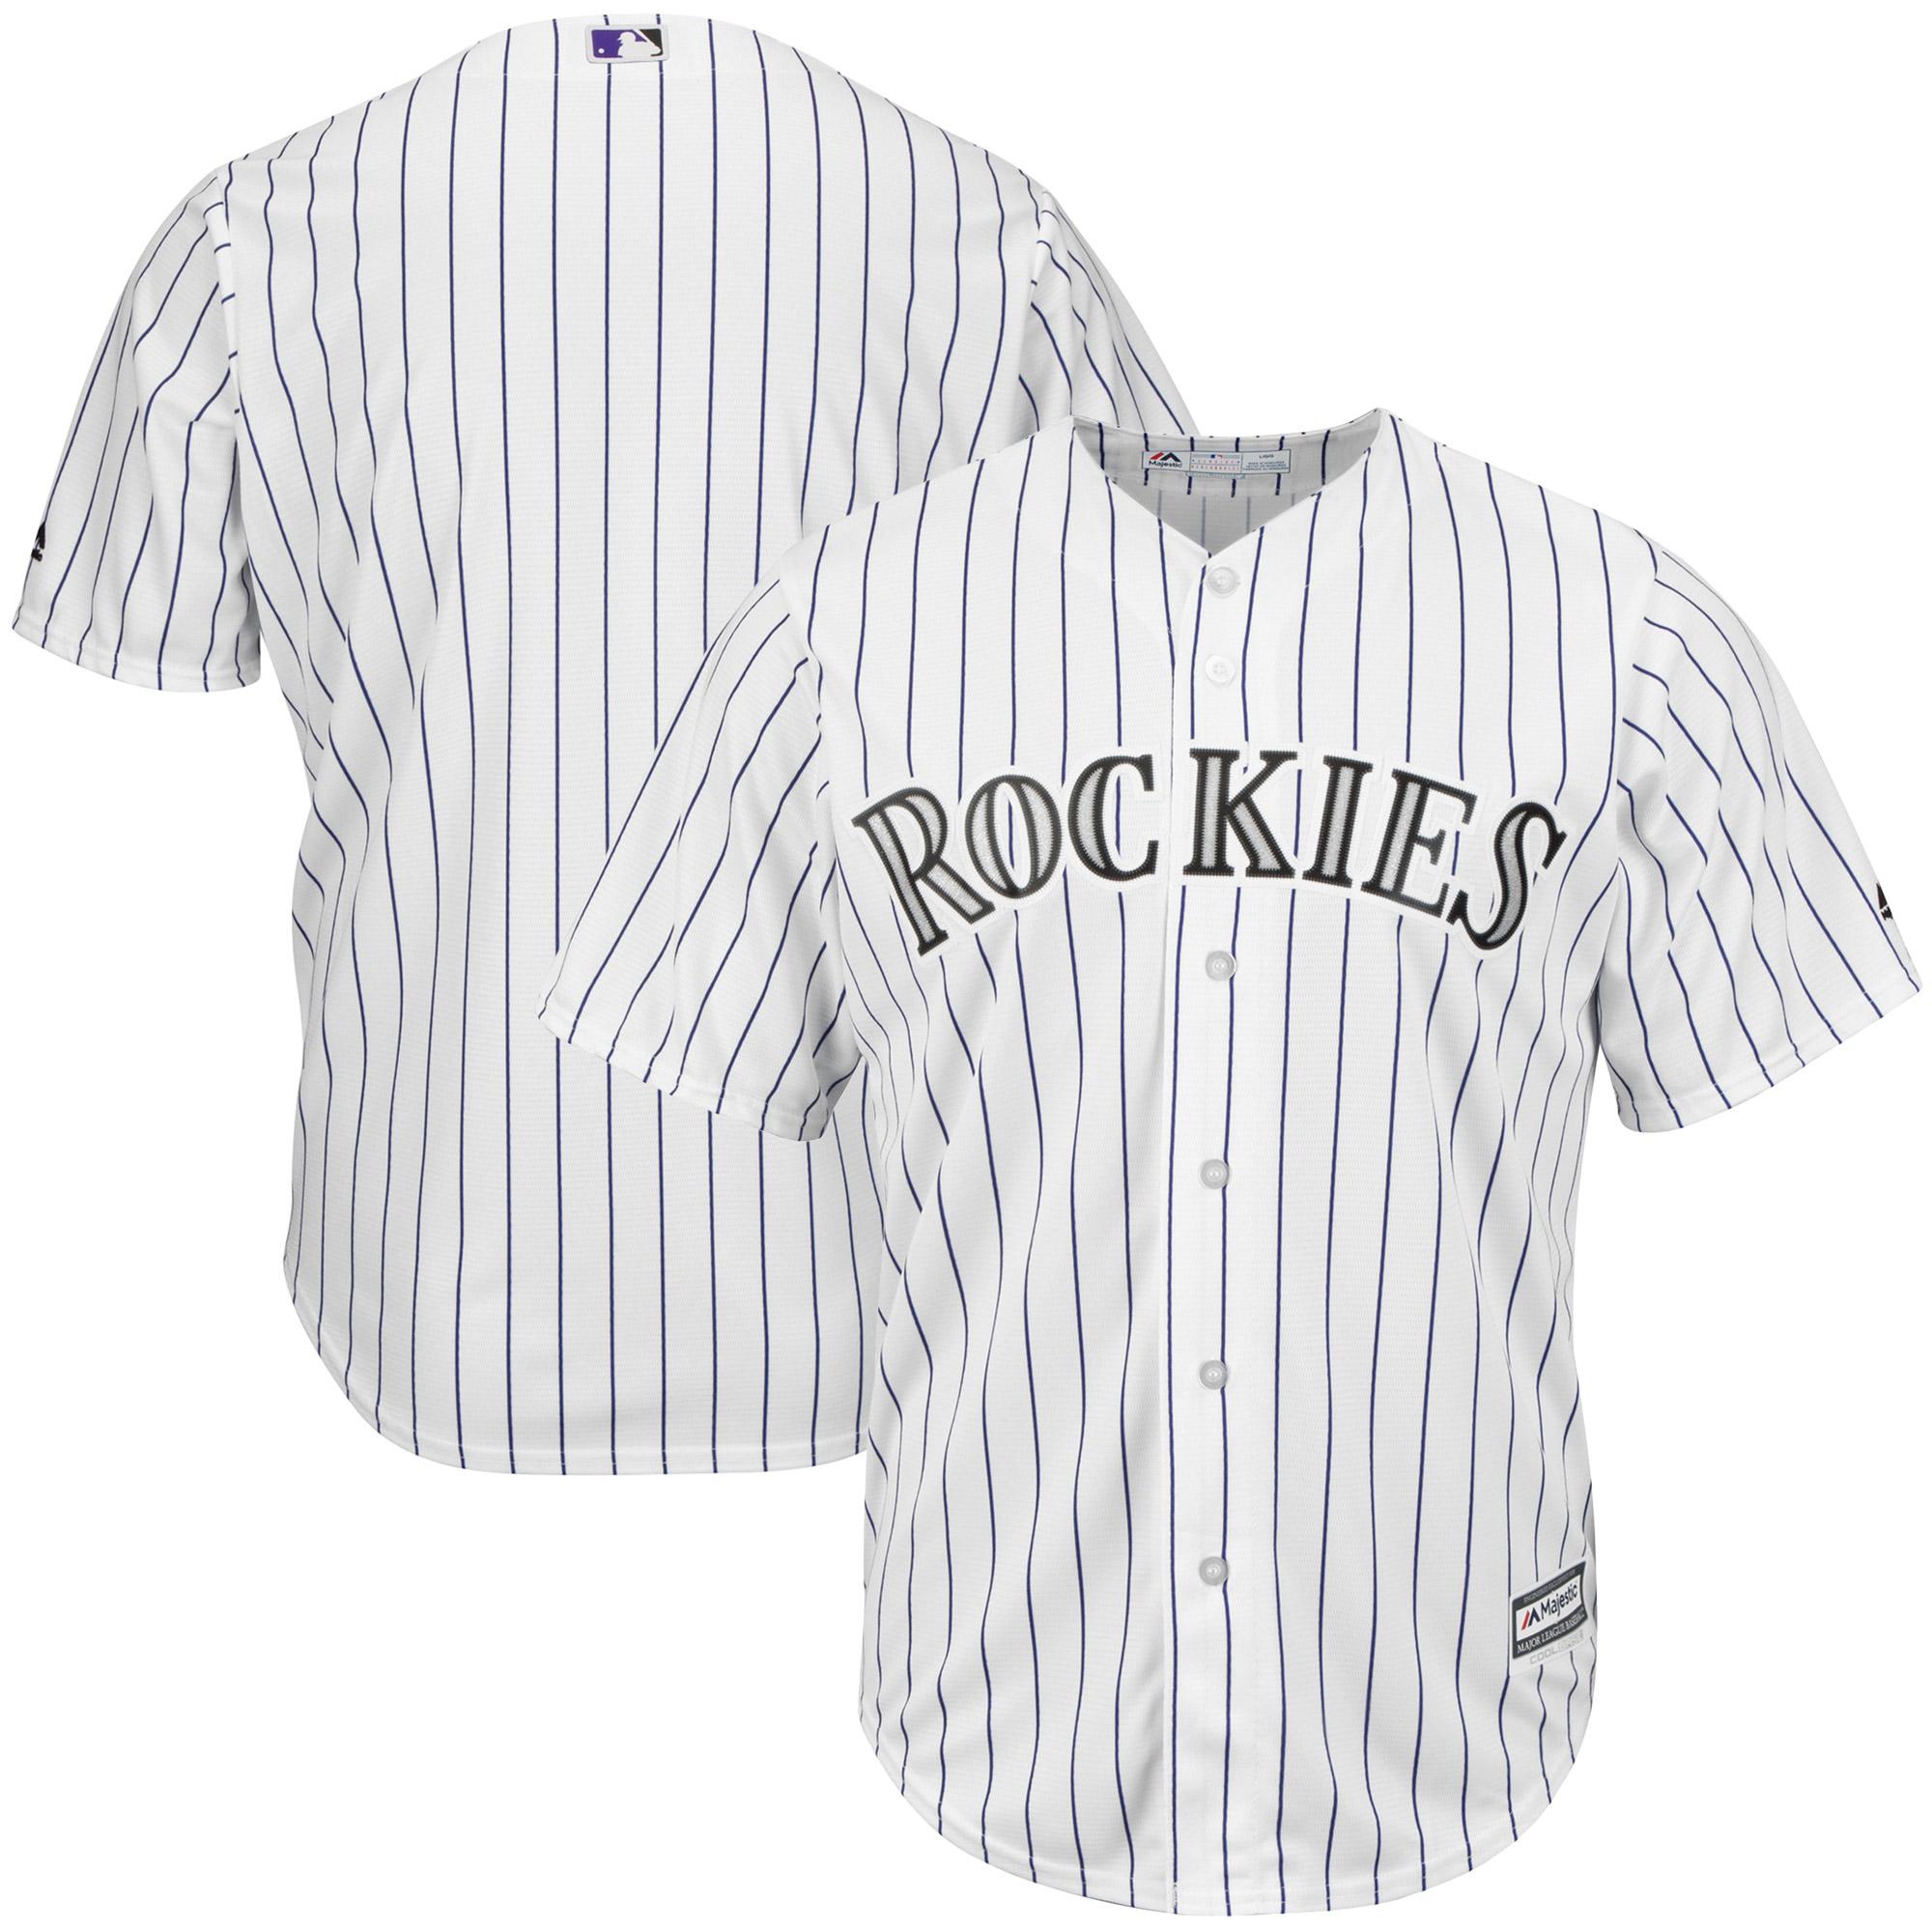 Colorado Rockies Majestic Big & Tall Cool Base Team Jersey - White/Purple